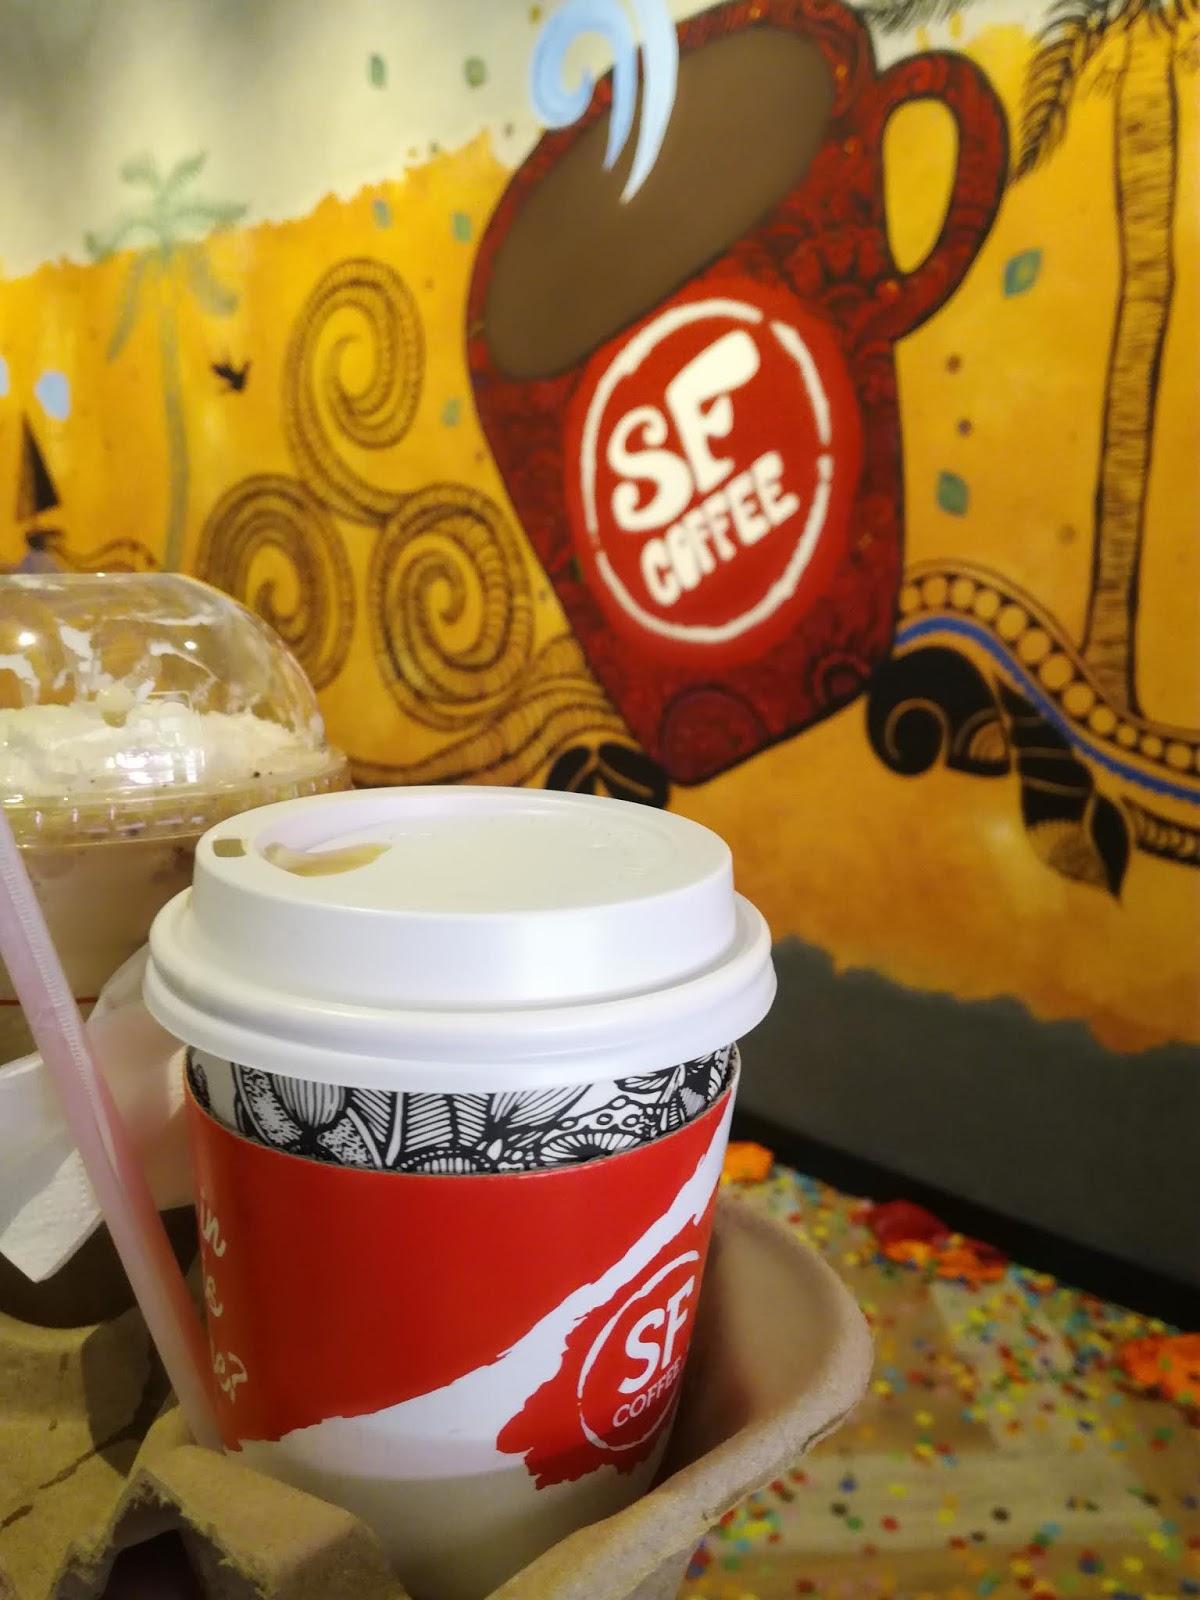 Perasmian Pembukaan  SF Coffee di Gurney Plaza Pulau Pinang Untuk Cawangan Utara